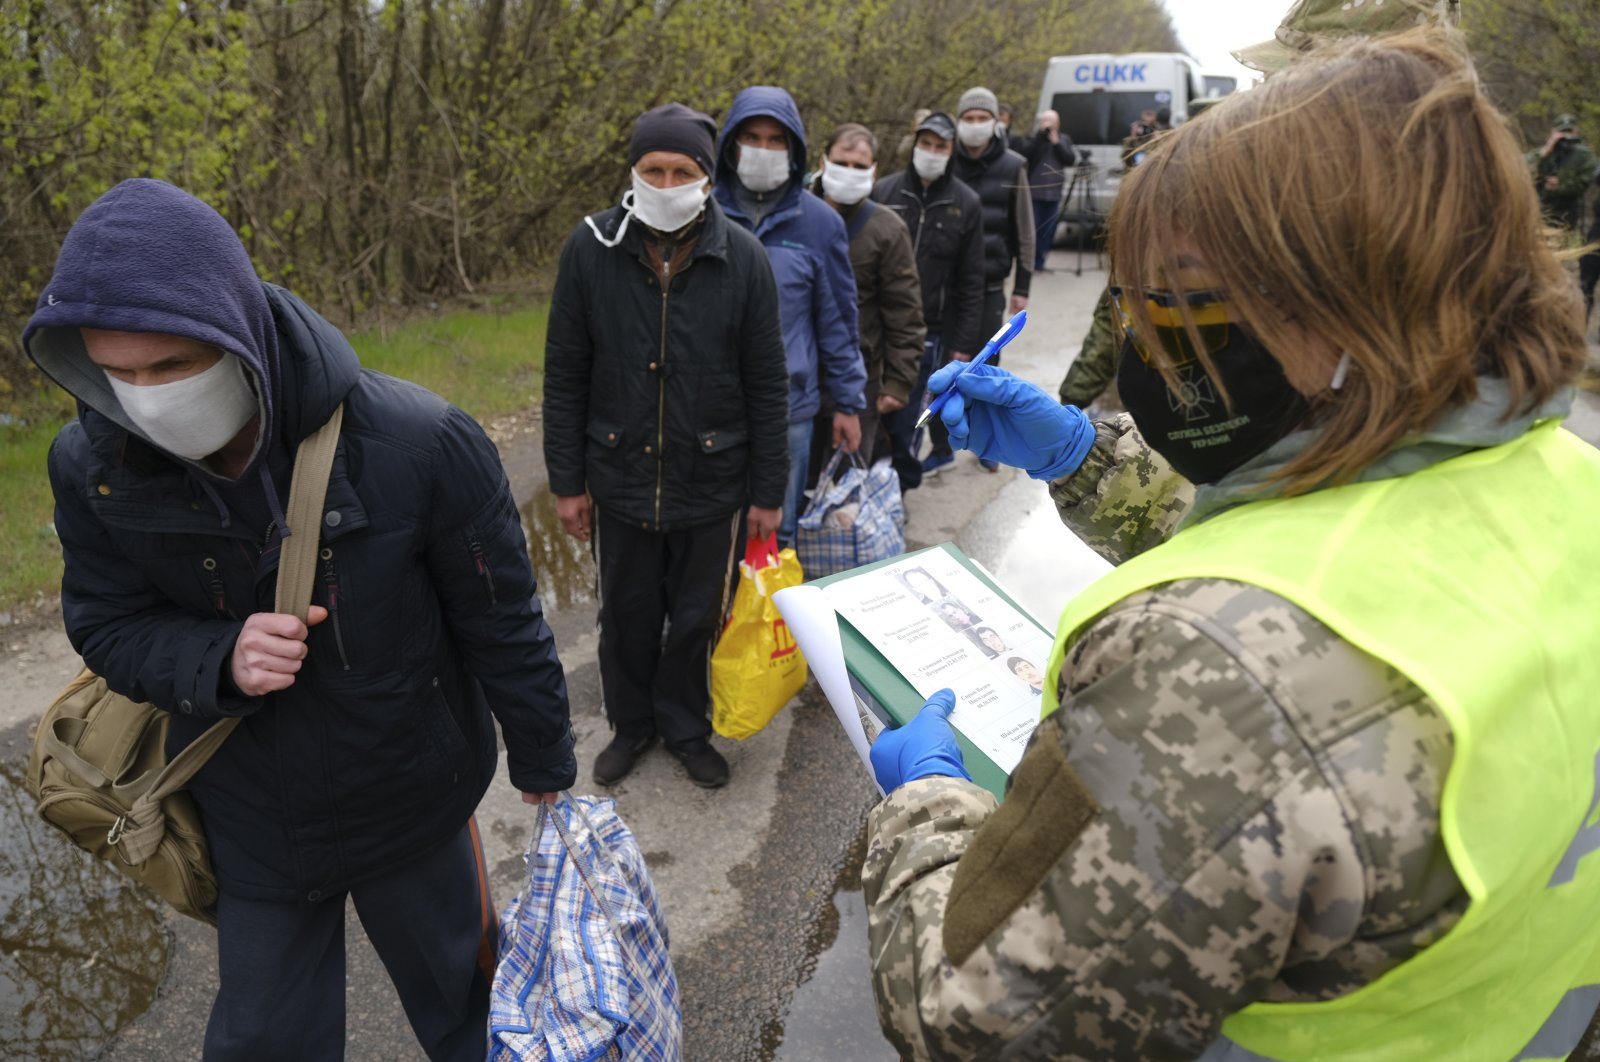 Russia-backed separatists war prisoners wearing masks to protect against coronavirus walk during a prisoner exchange, near Gorlivka, Donetsk region, eastern Ukraine, April 16, 2020. (AP Photo)